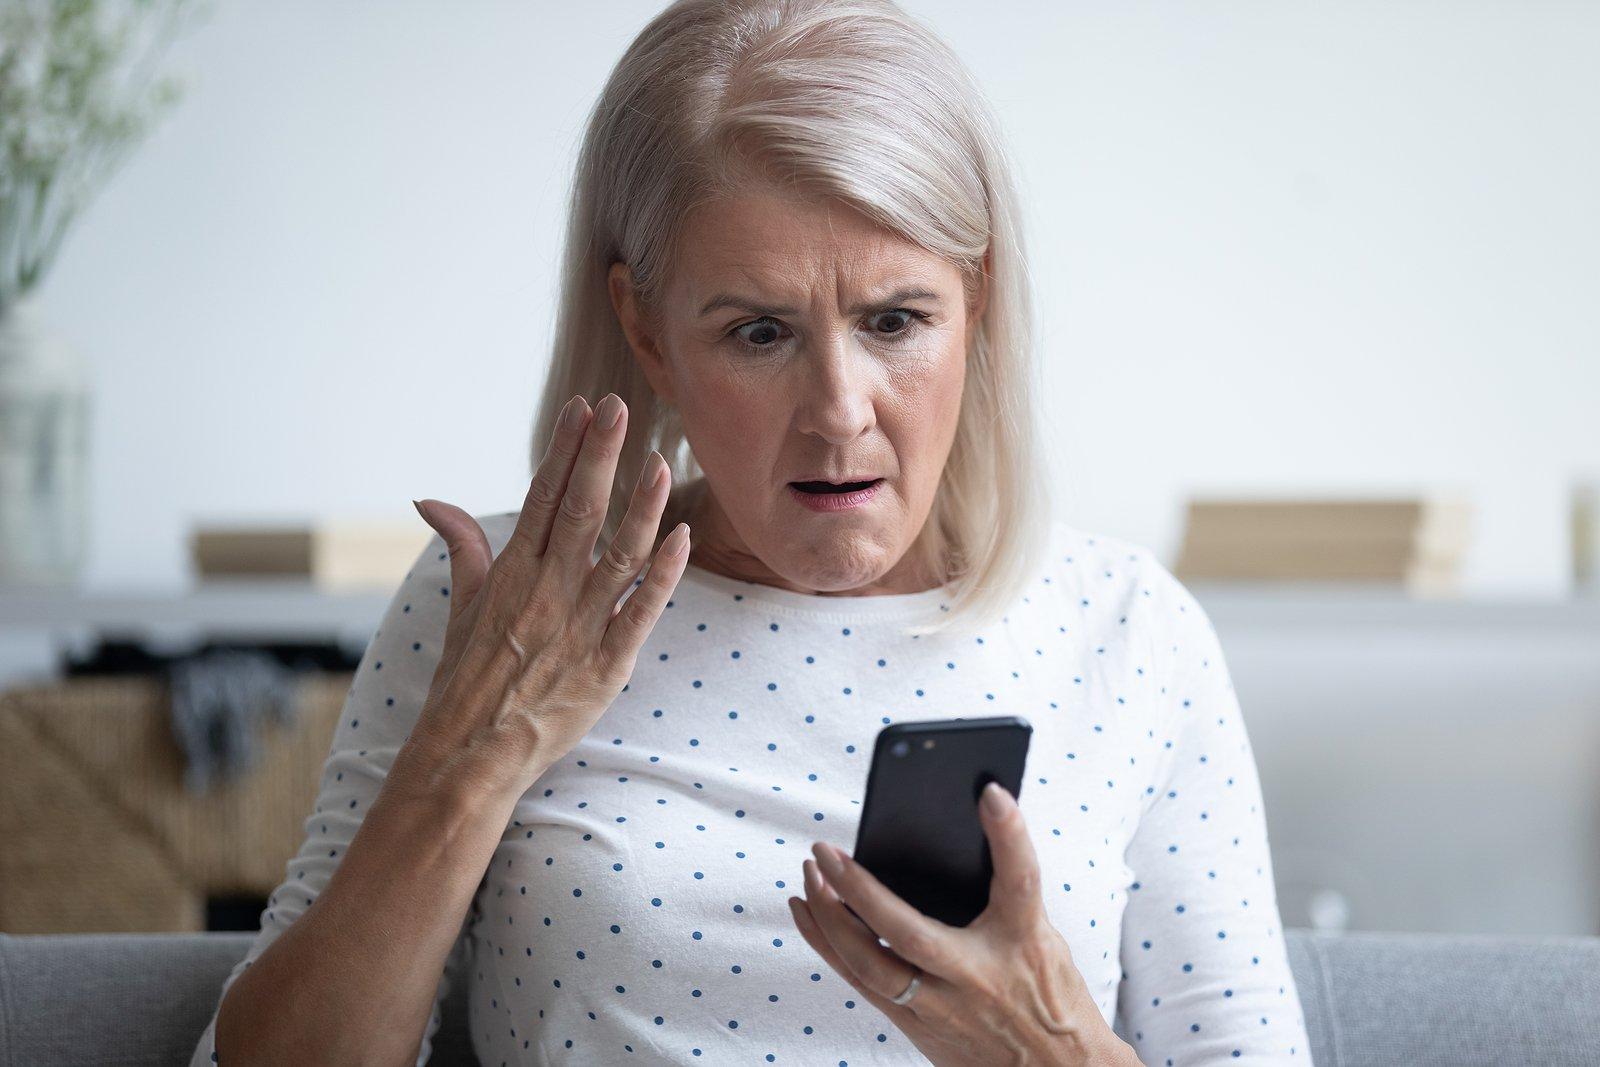 bigstock-Mad-Elderly-Woman-Holding-Smar-336837388